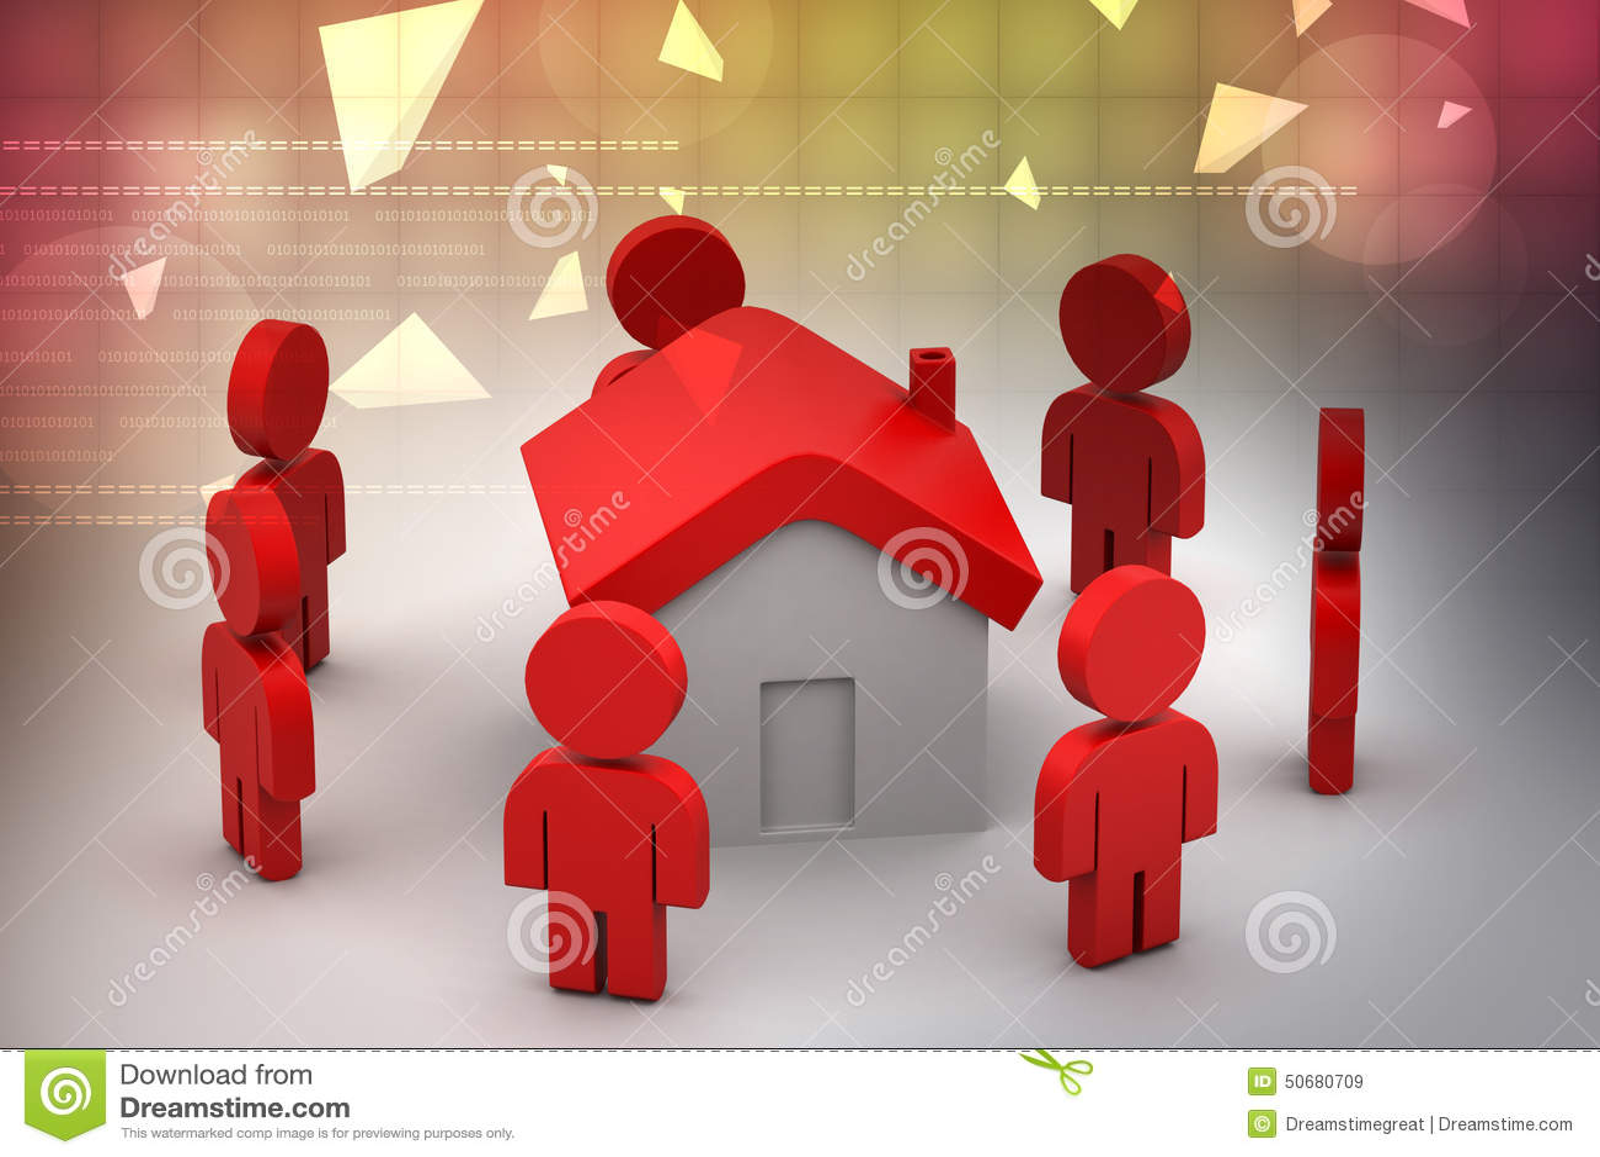 Download 3d有家的,房地产概念人们 库存例证. 插画 包括有 背包, 布琼布拉, 建筑, 庄园, 例证, 查出, 任何地方 - 50680709